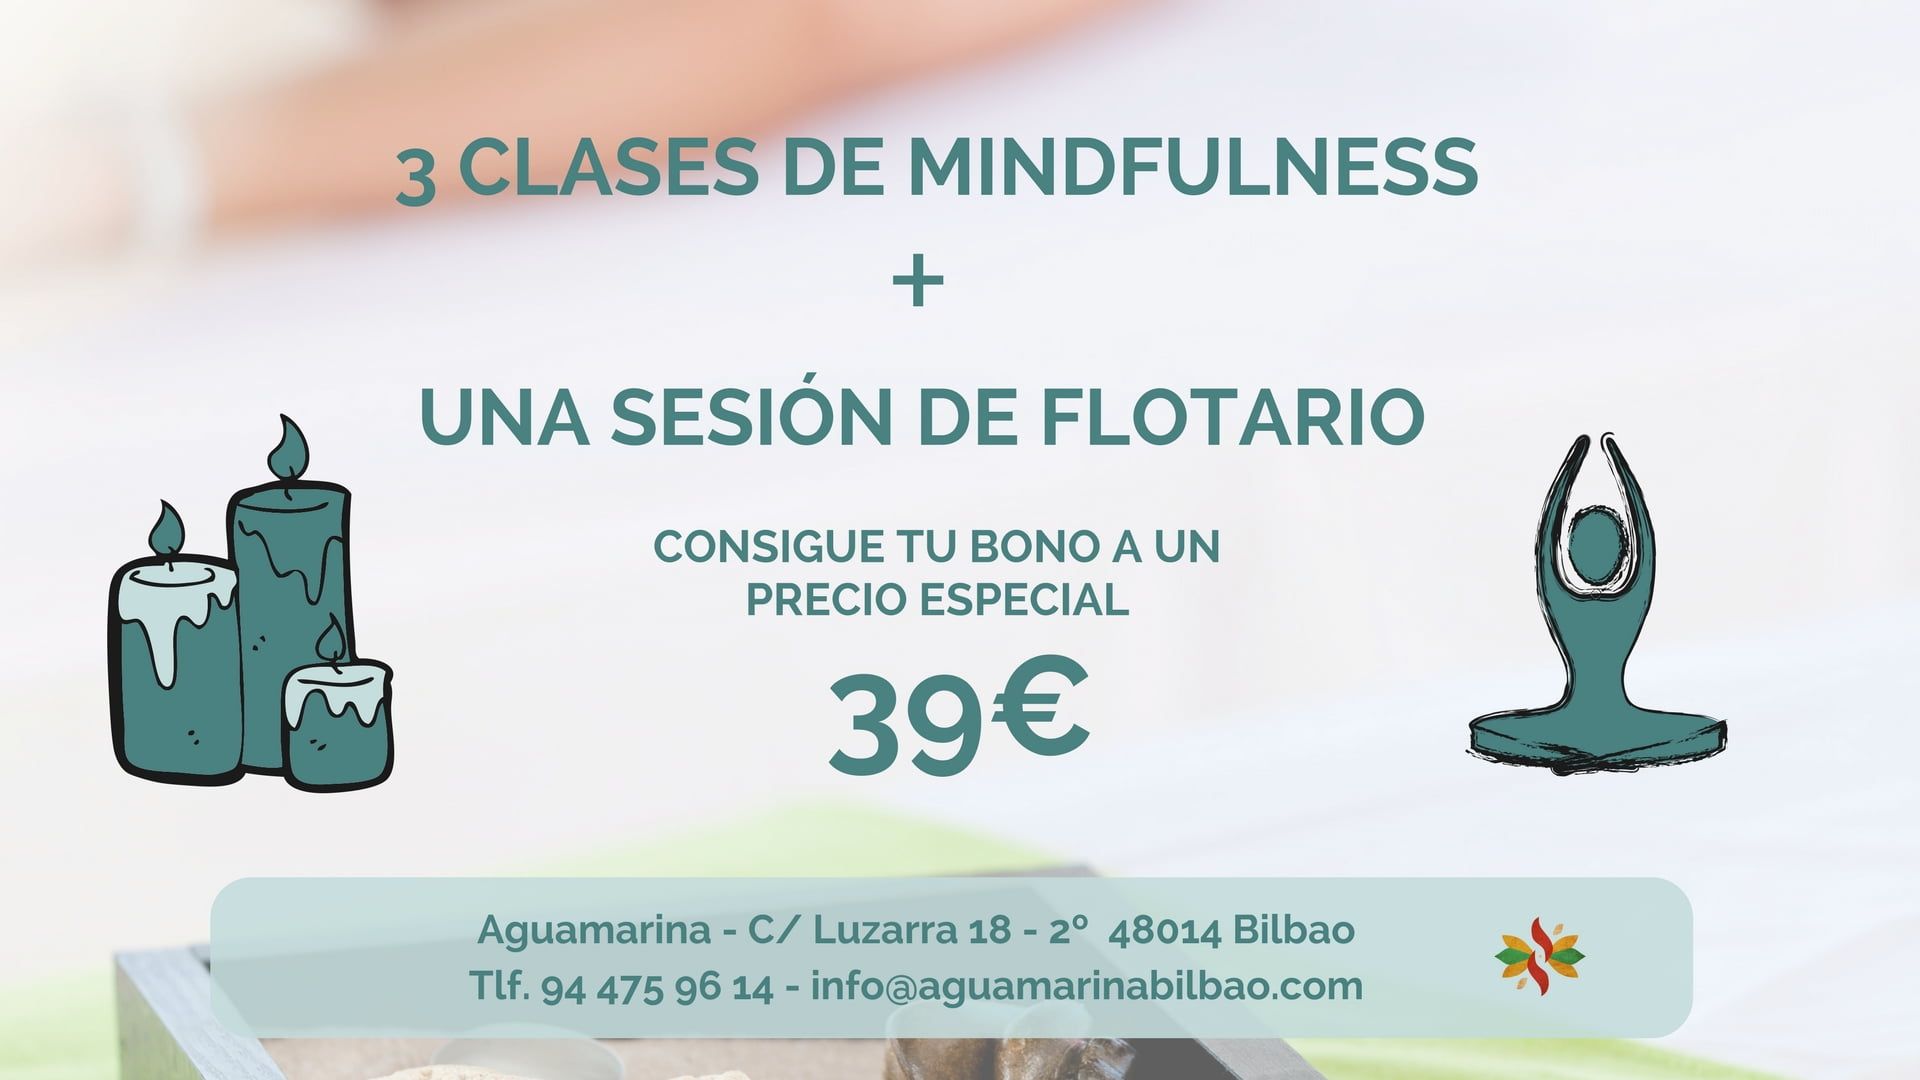 mindfulness en bilbao